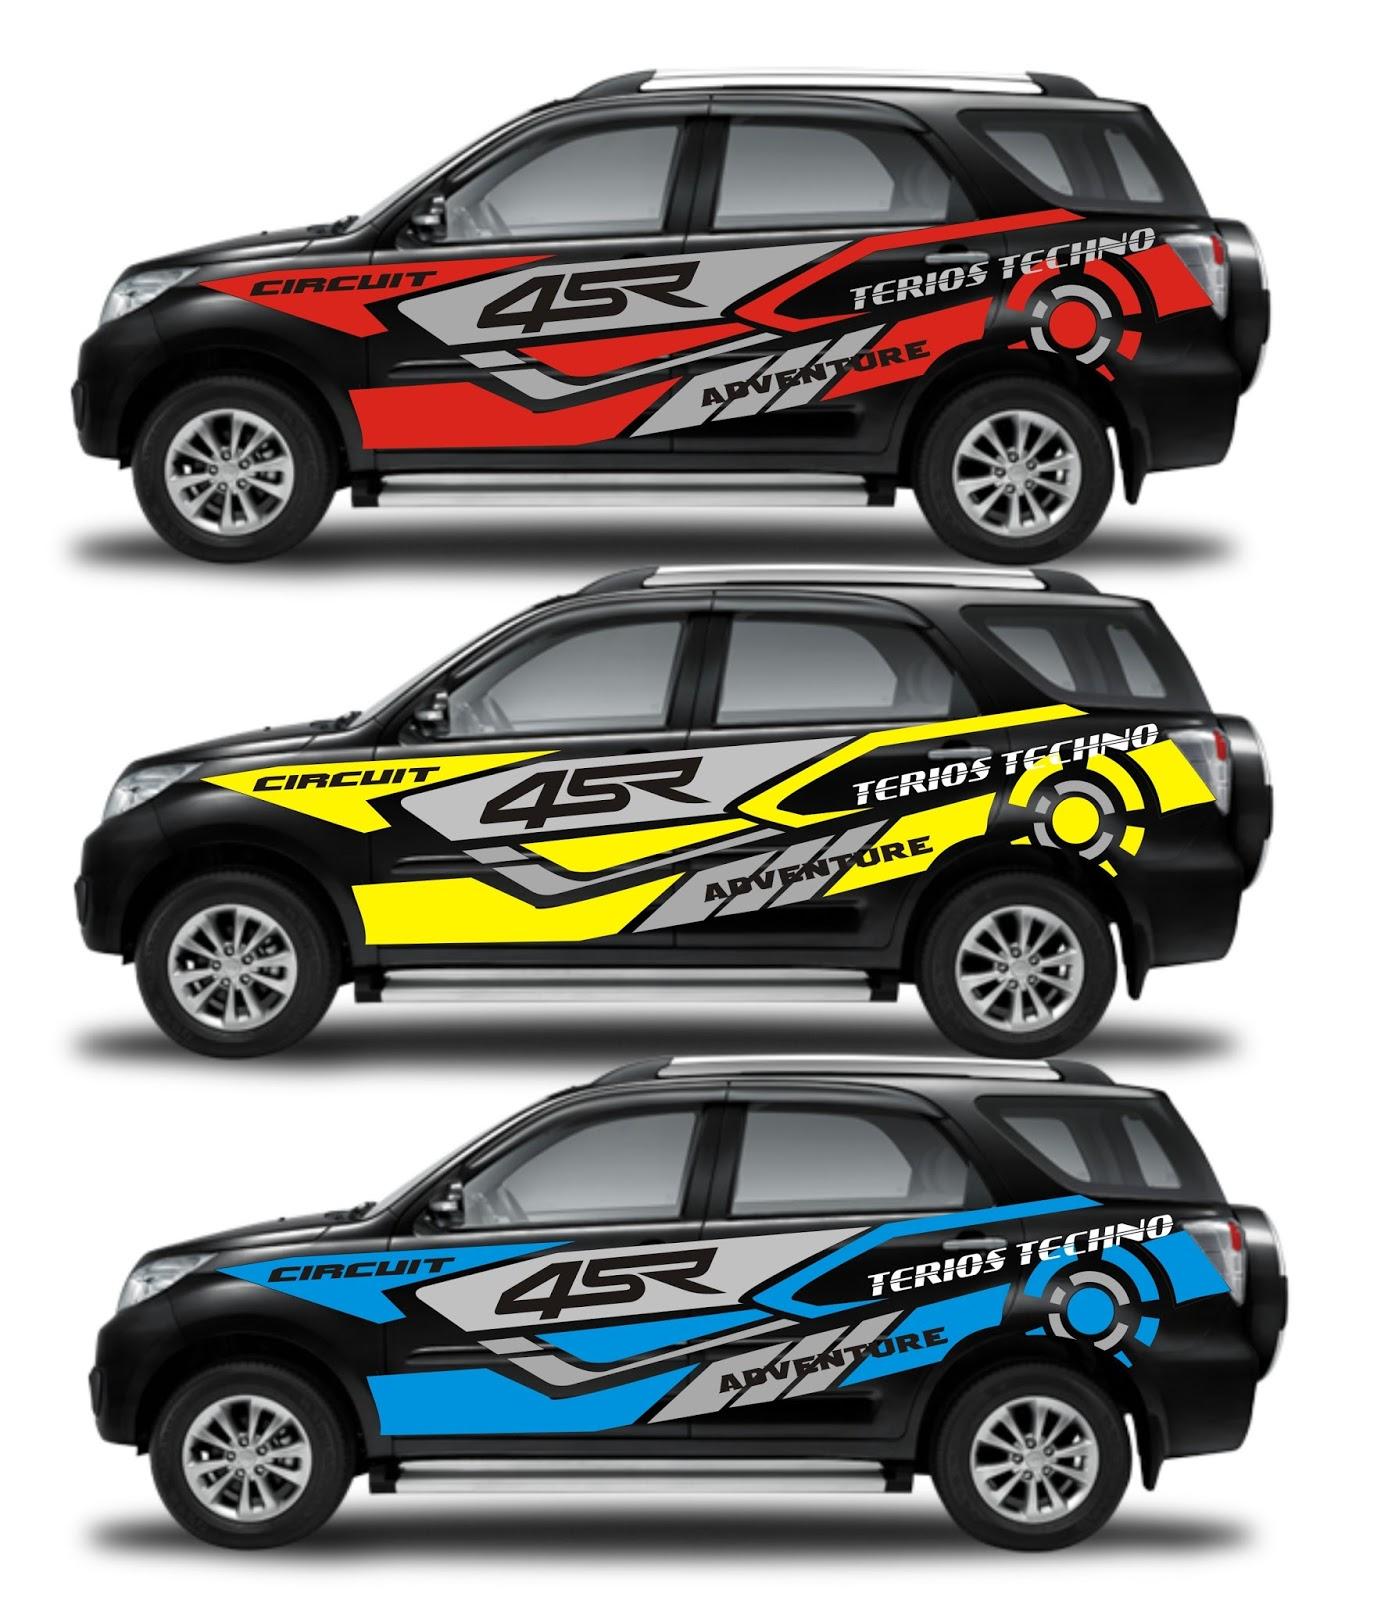 48 Top Populer Cutting Sticker Mobil Rush Terkini Otomotif